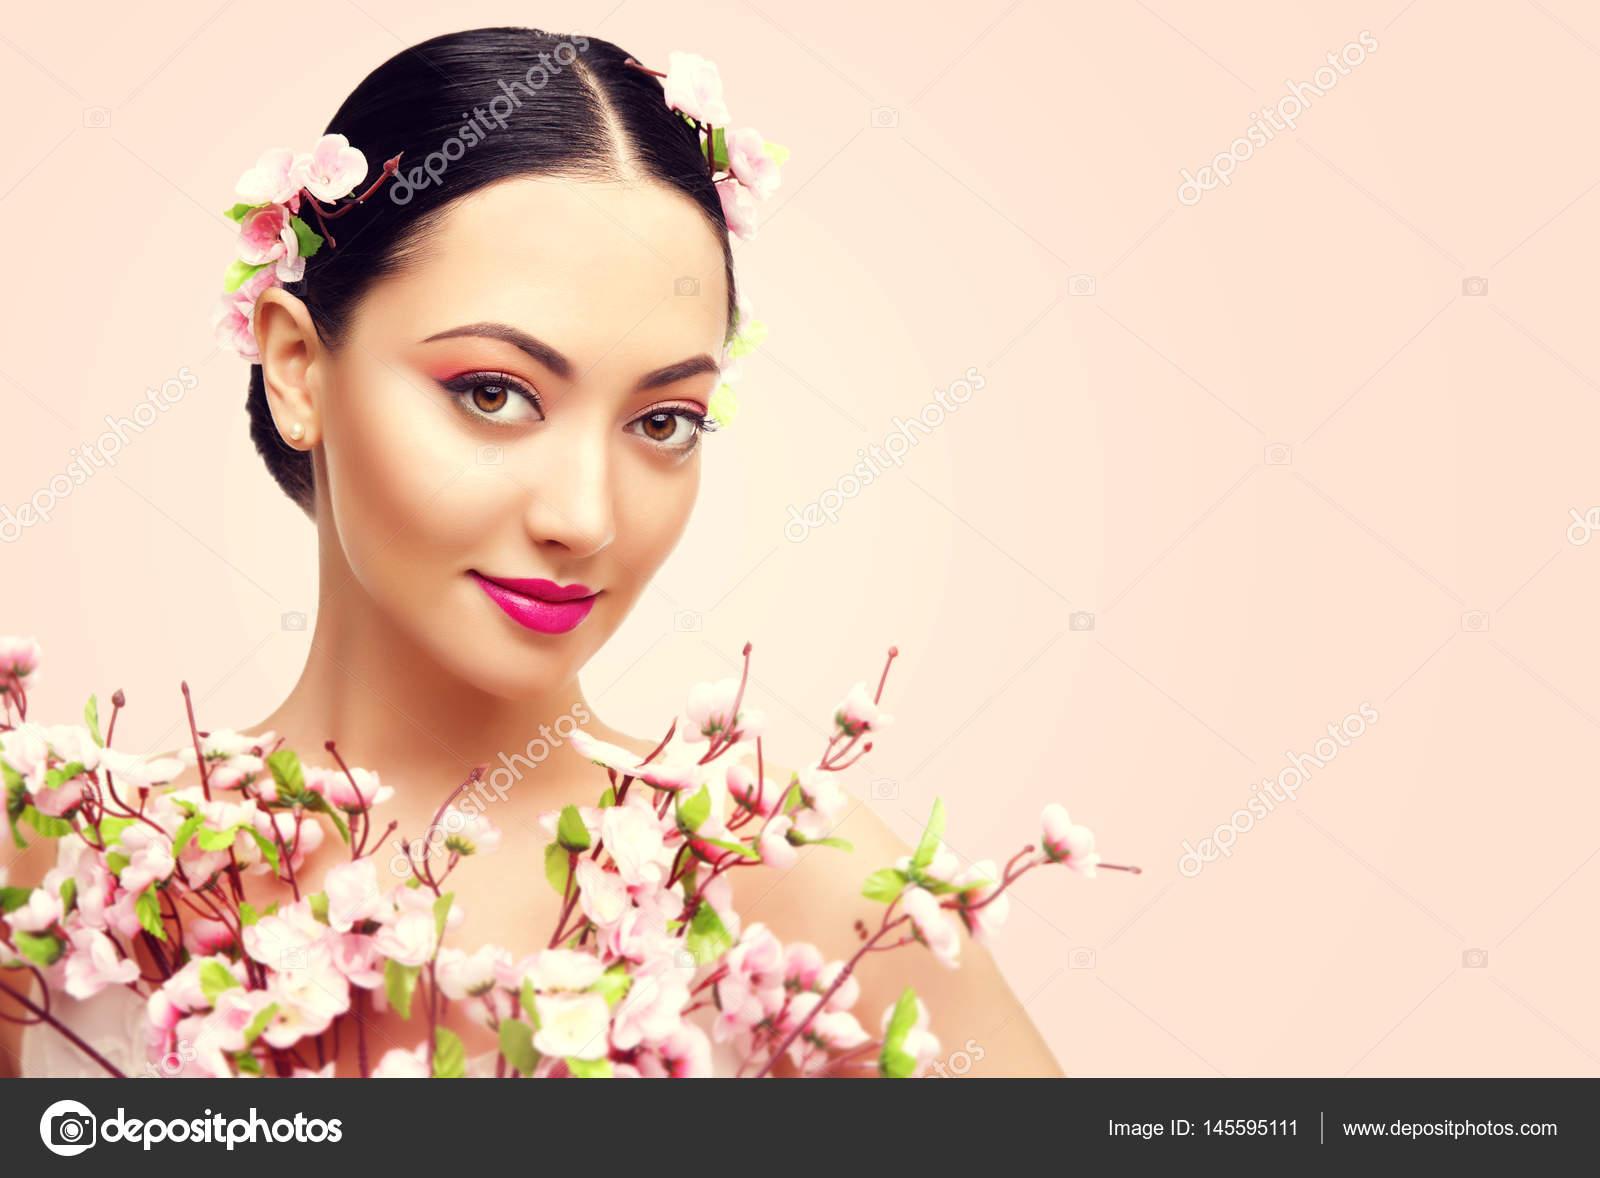 Japanese girl and flowers asian woman beauty makeup beautiful japanese girl and flowers asian woman beauty makeup beautiful fashion model stock photo izmirmasajfo